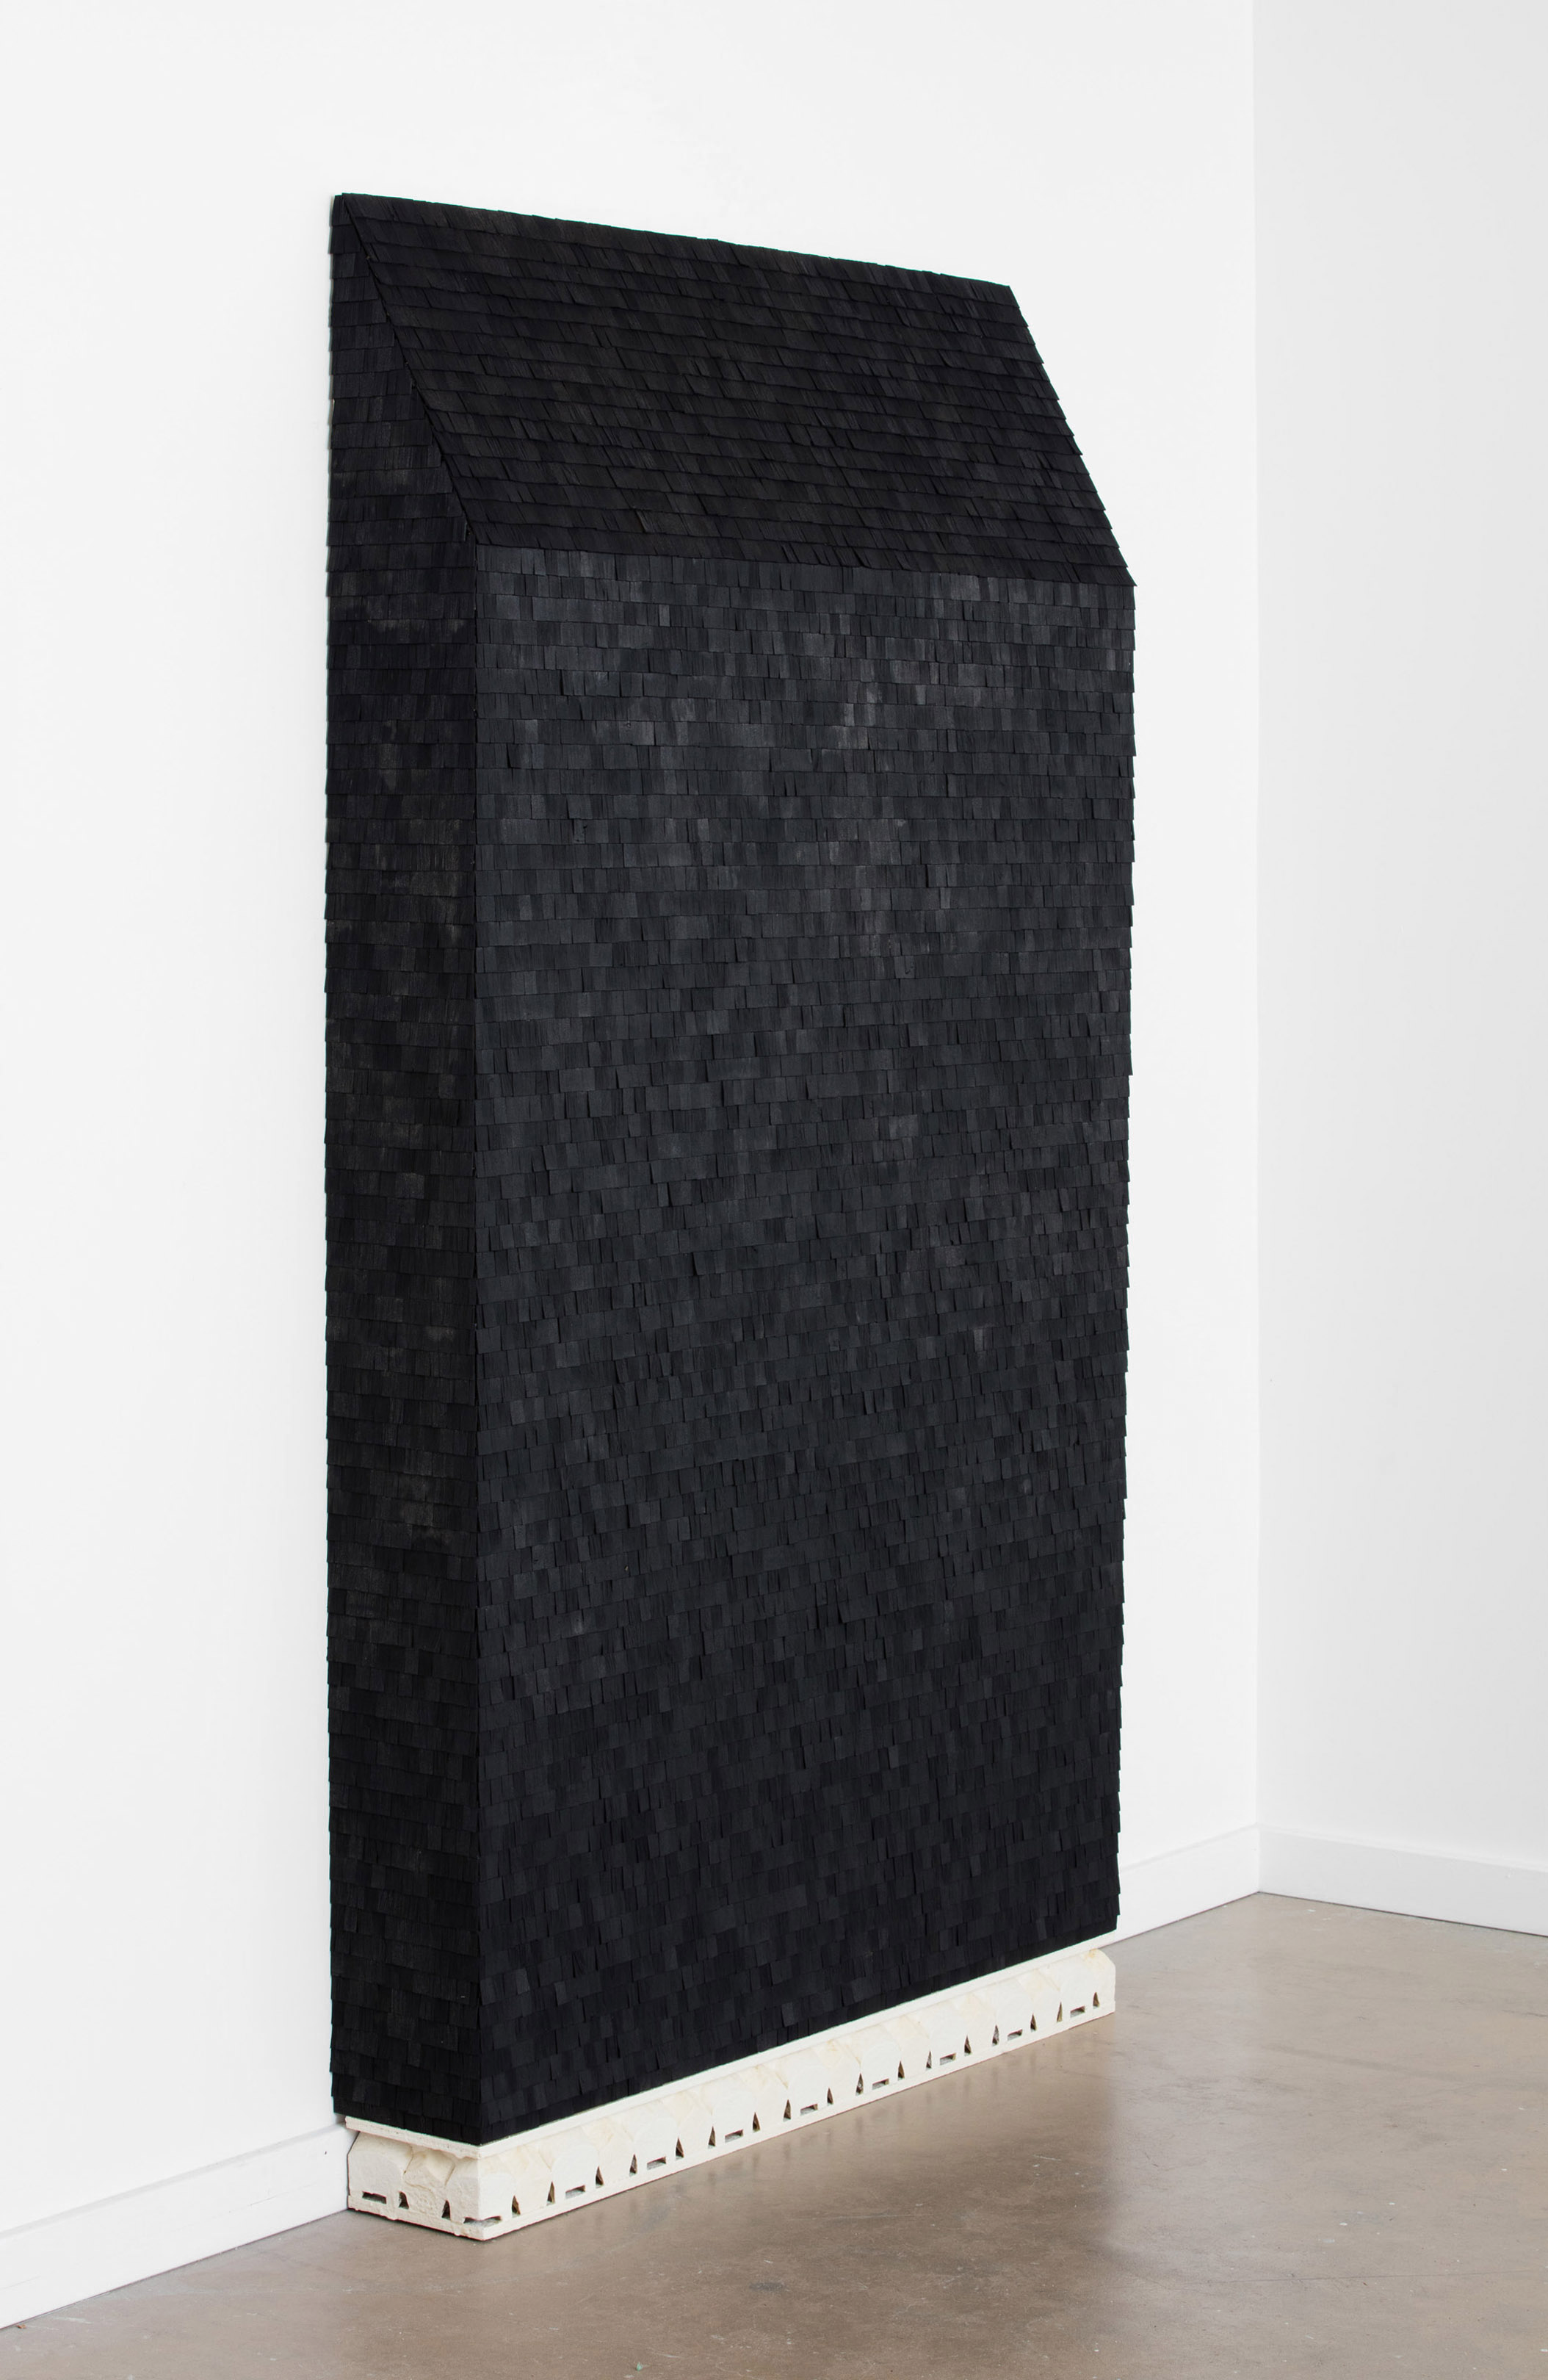 Cal Siegel , coughin , 2016. Wood, dollhouse shingles, acrylic, plaster, 82 x 48.5 x 8 inches.